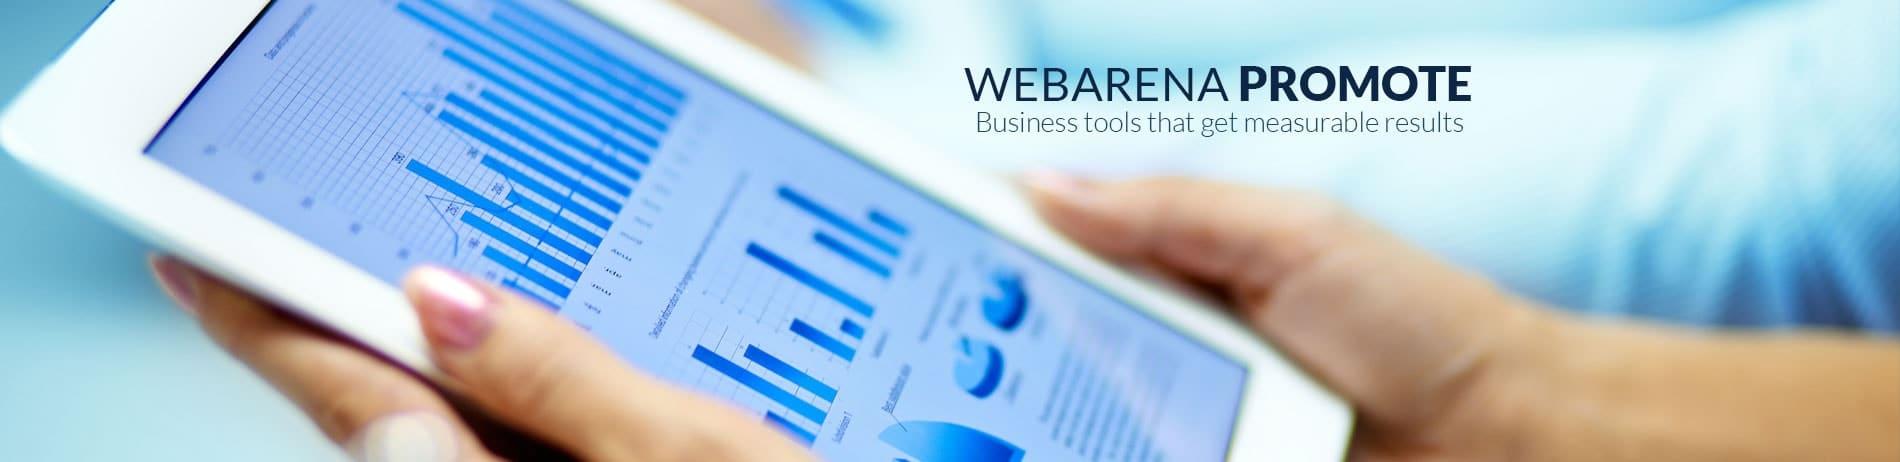 Webarena Australia Pty Ltd